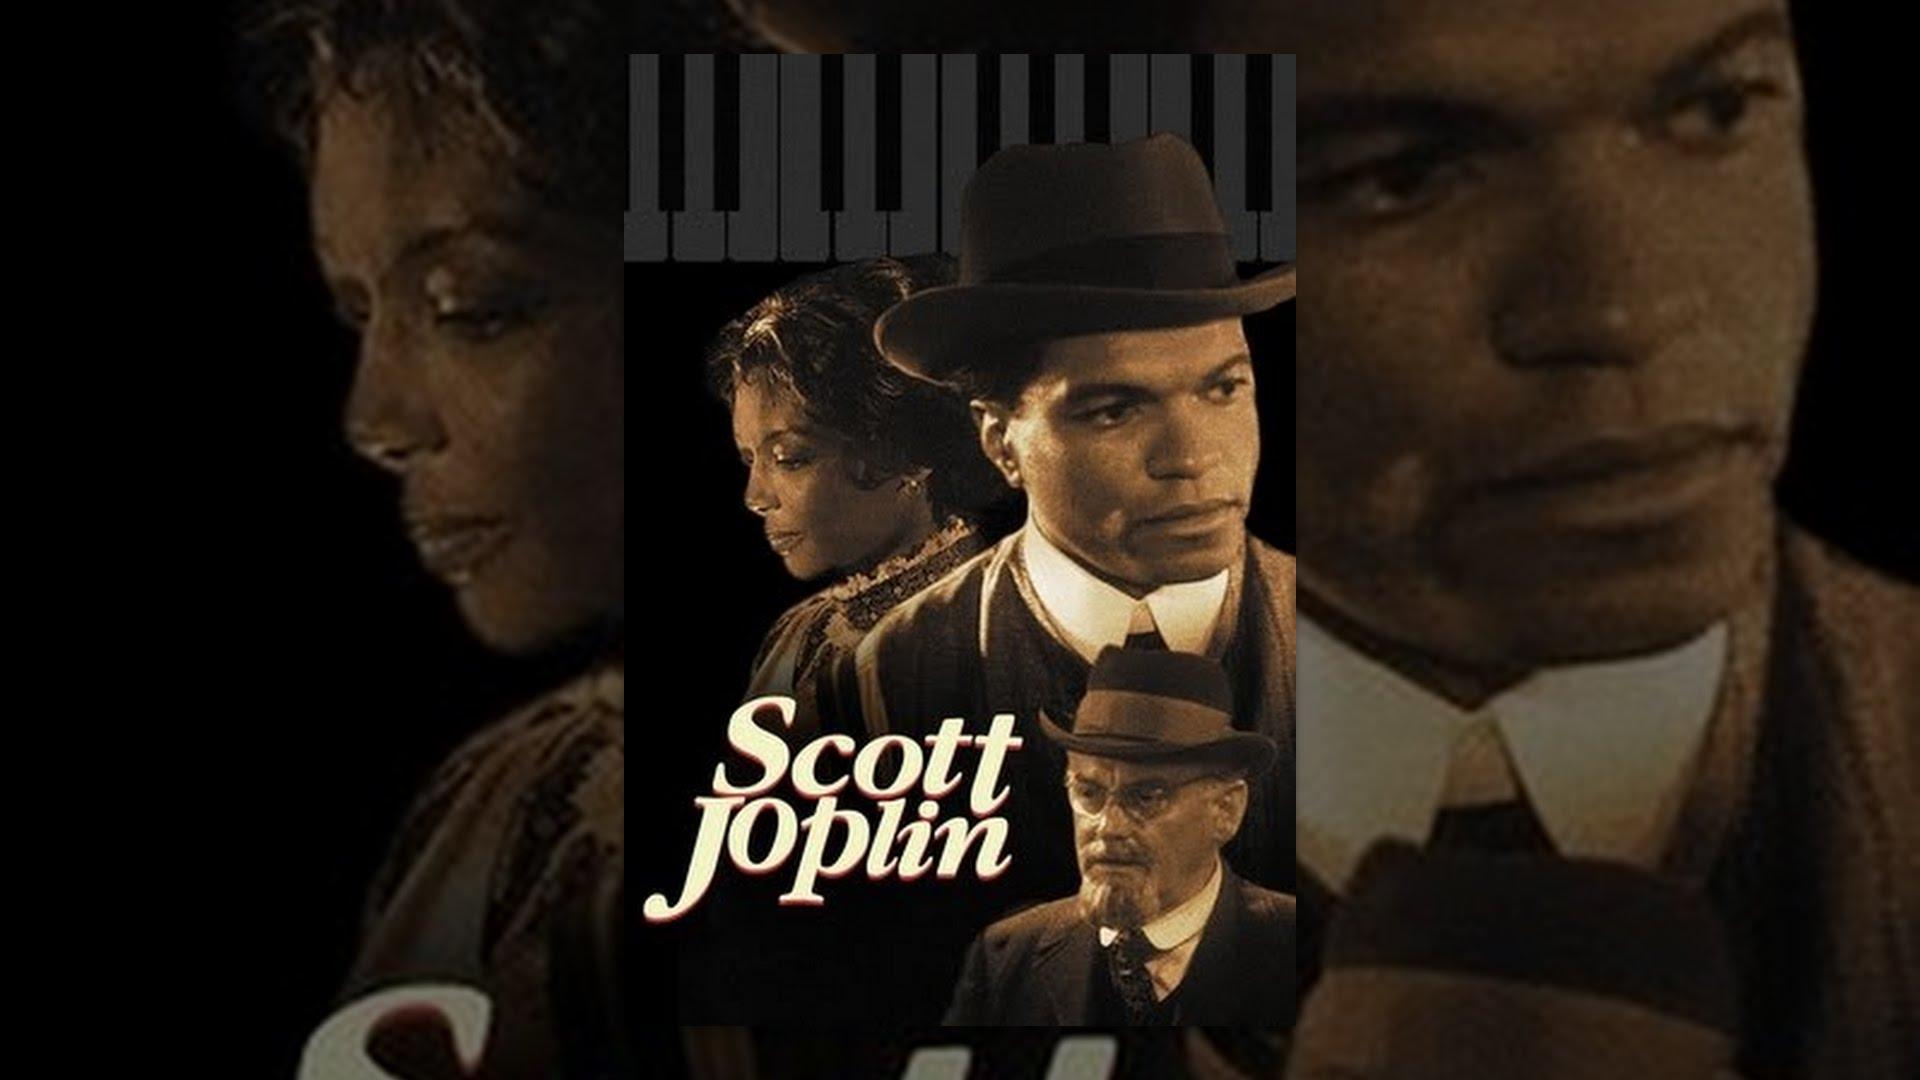 Movie scott joplin